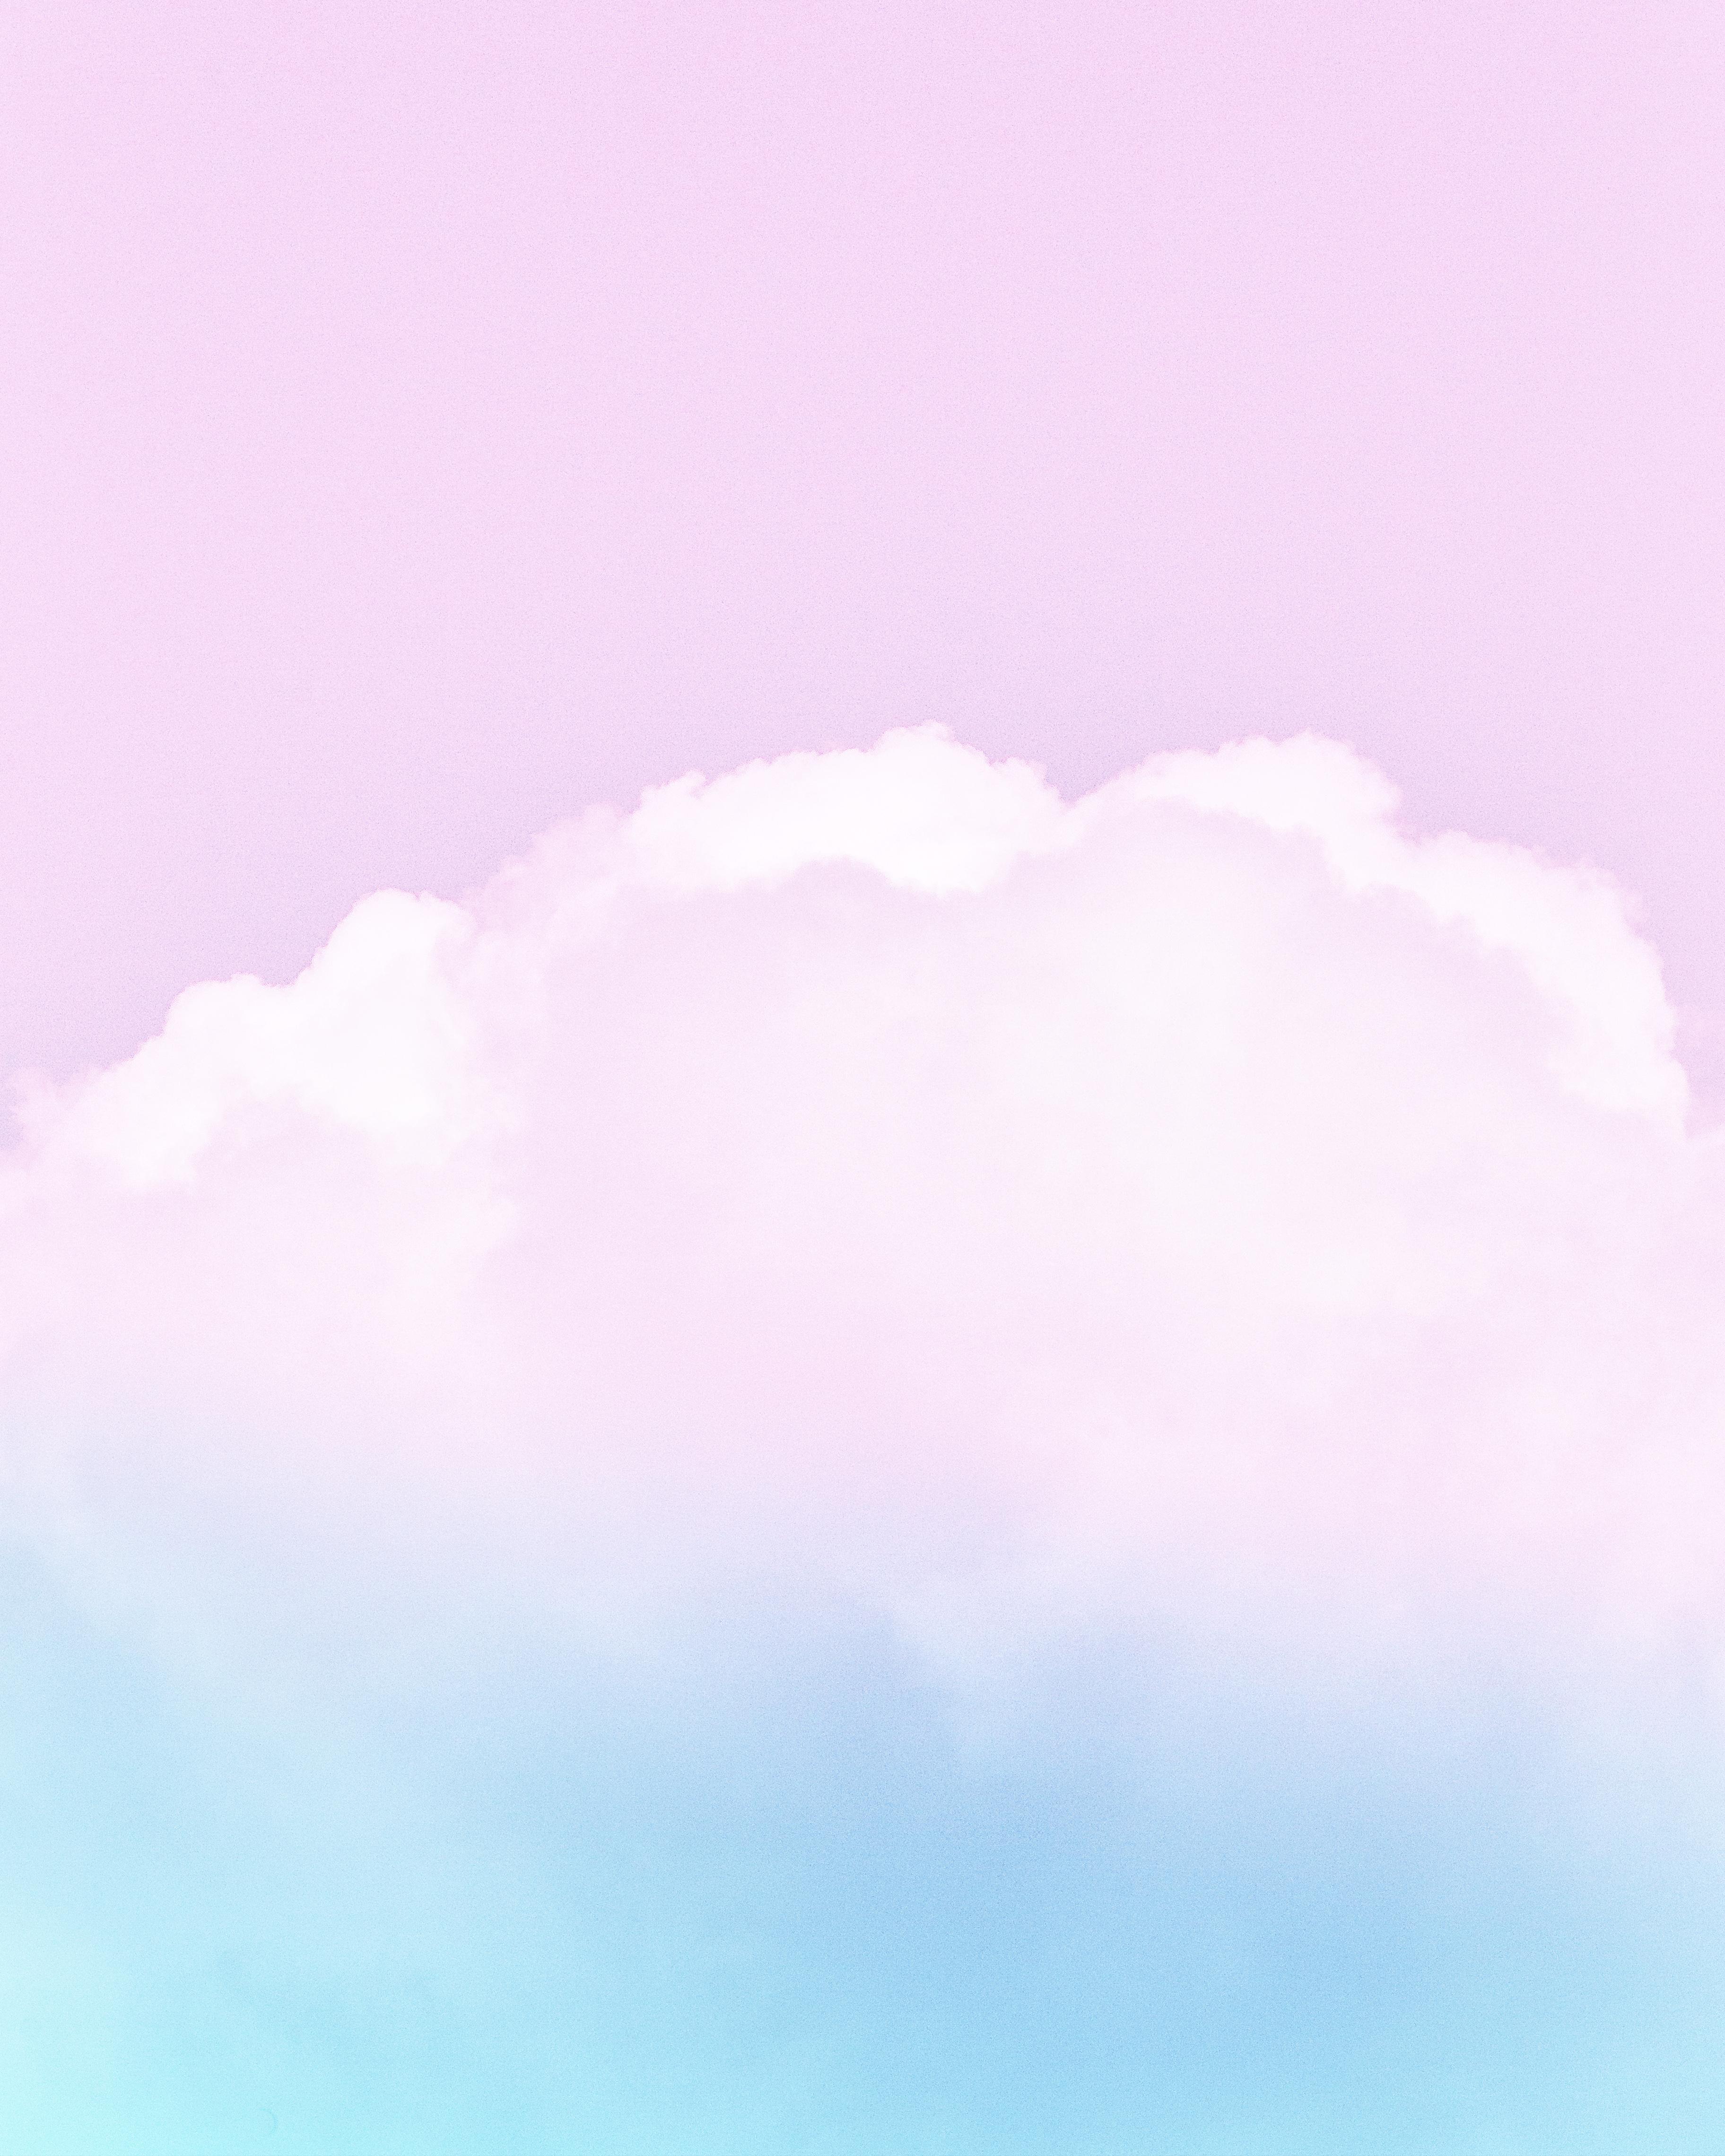 Oct 02, 2021 · foto profil wa tema awan biru. 23 Gambar Wallpaper Keren Awan Gambar Keren Hd